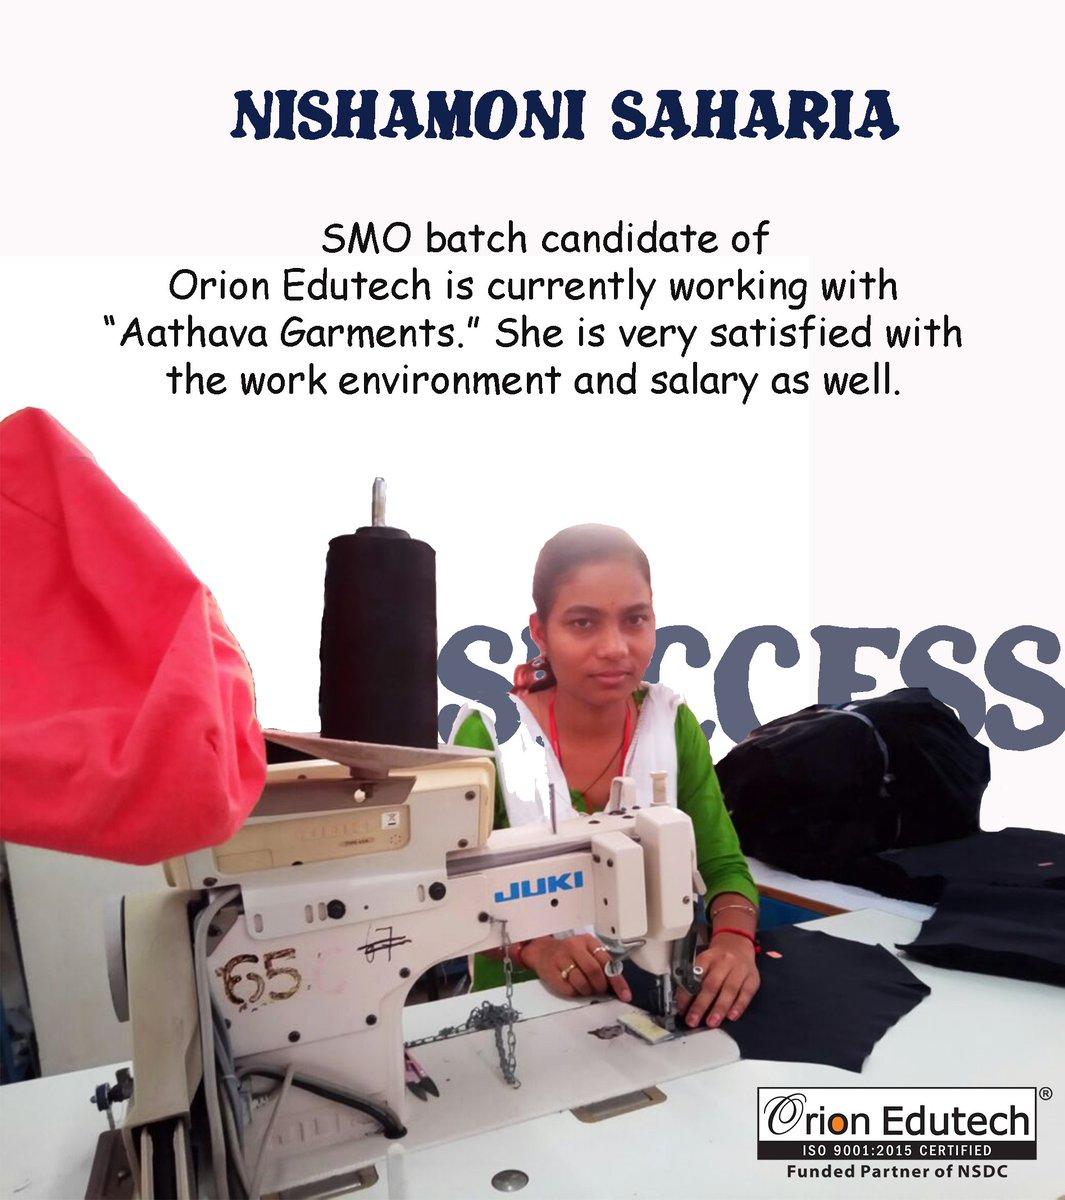 She Is Working With Aathava Garments SkillIndia MSDESkillIndia NSDCINDIA Dpradhanbjp Manish Kumar AnantkumarH RajeshAgrawal94